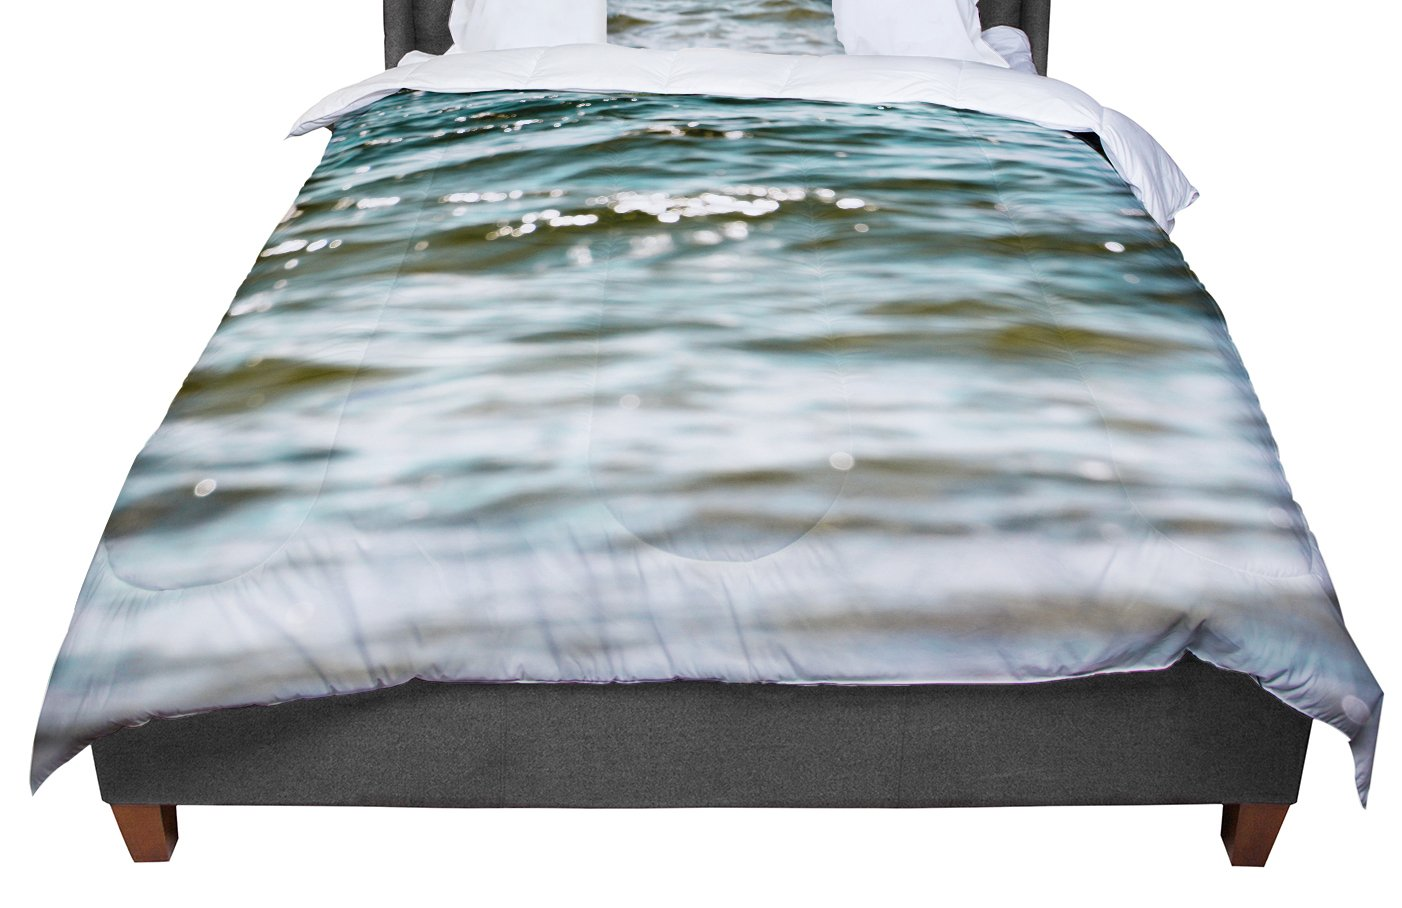 68 X 88 KESS InHouse Debbra Obertanec Turquoise Blue Green Water Twin Comforter